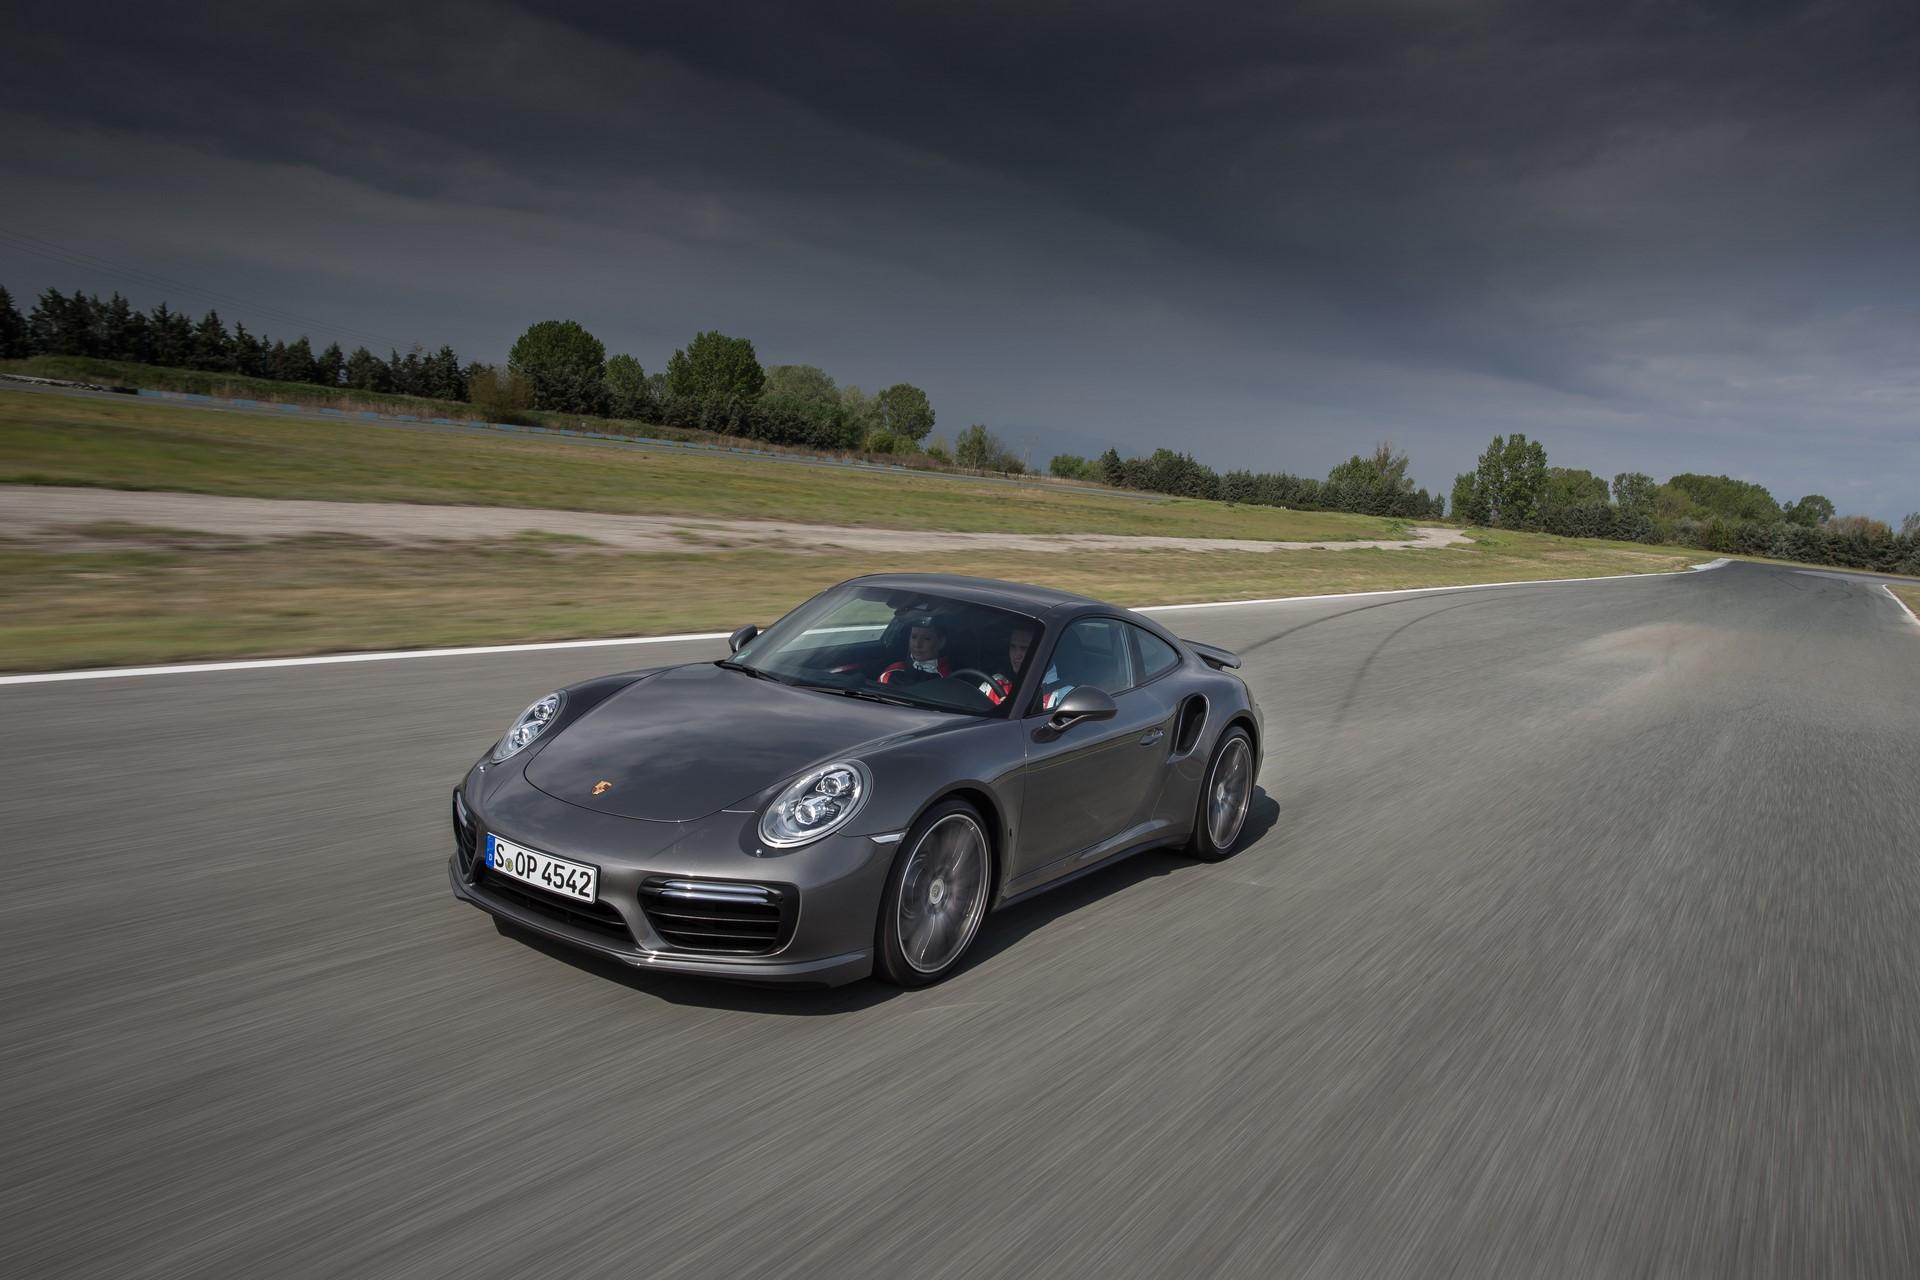 Porsche Driving Experience 2017 Serres (23)